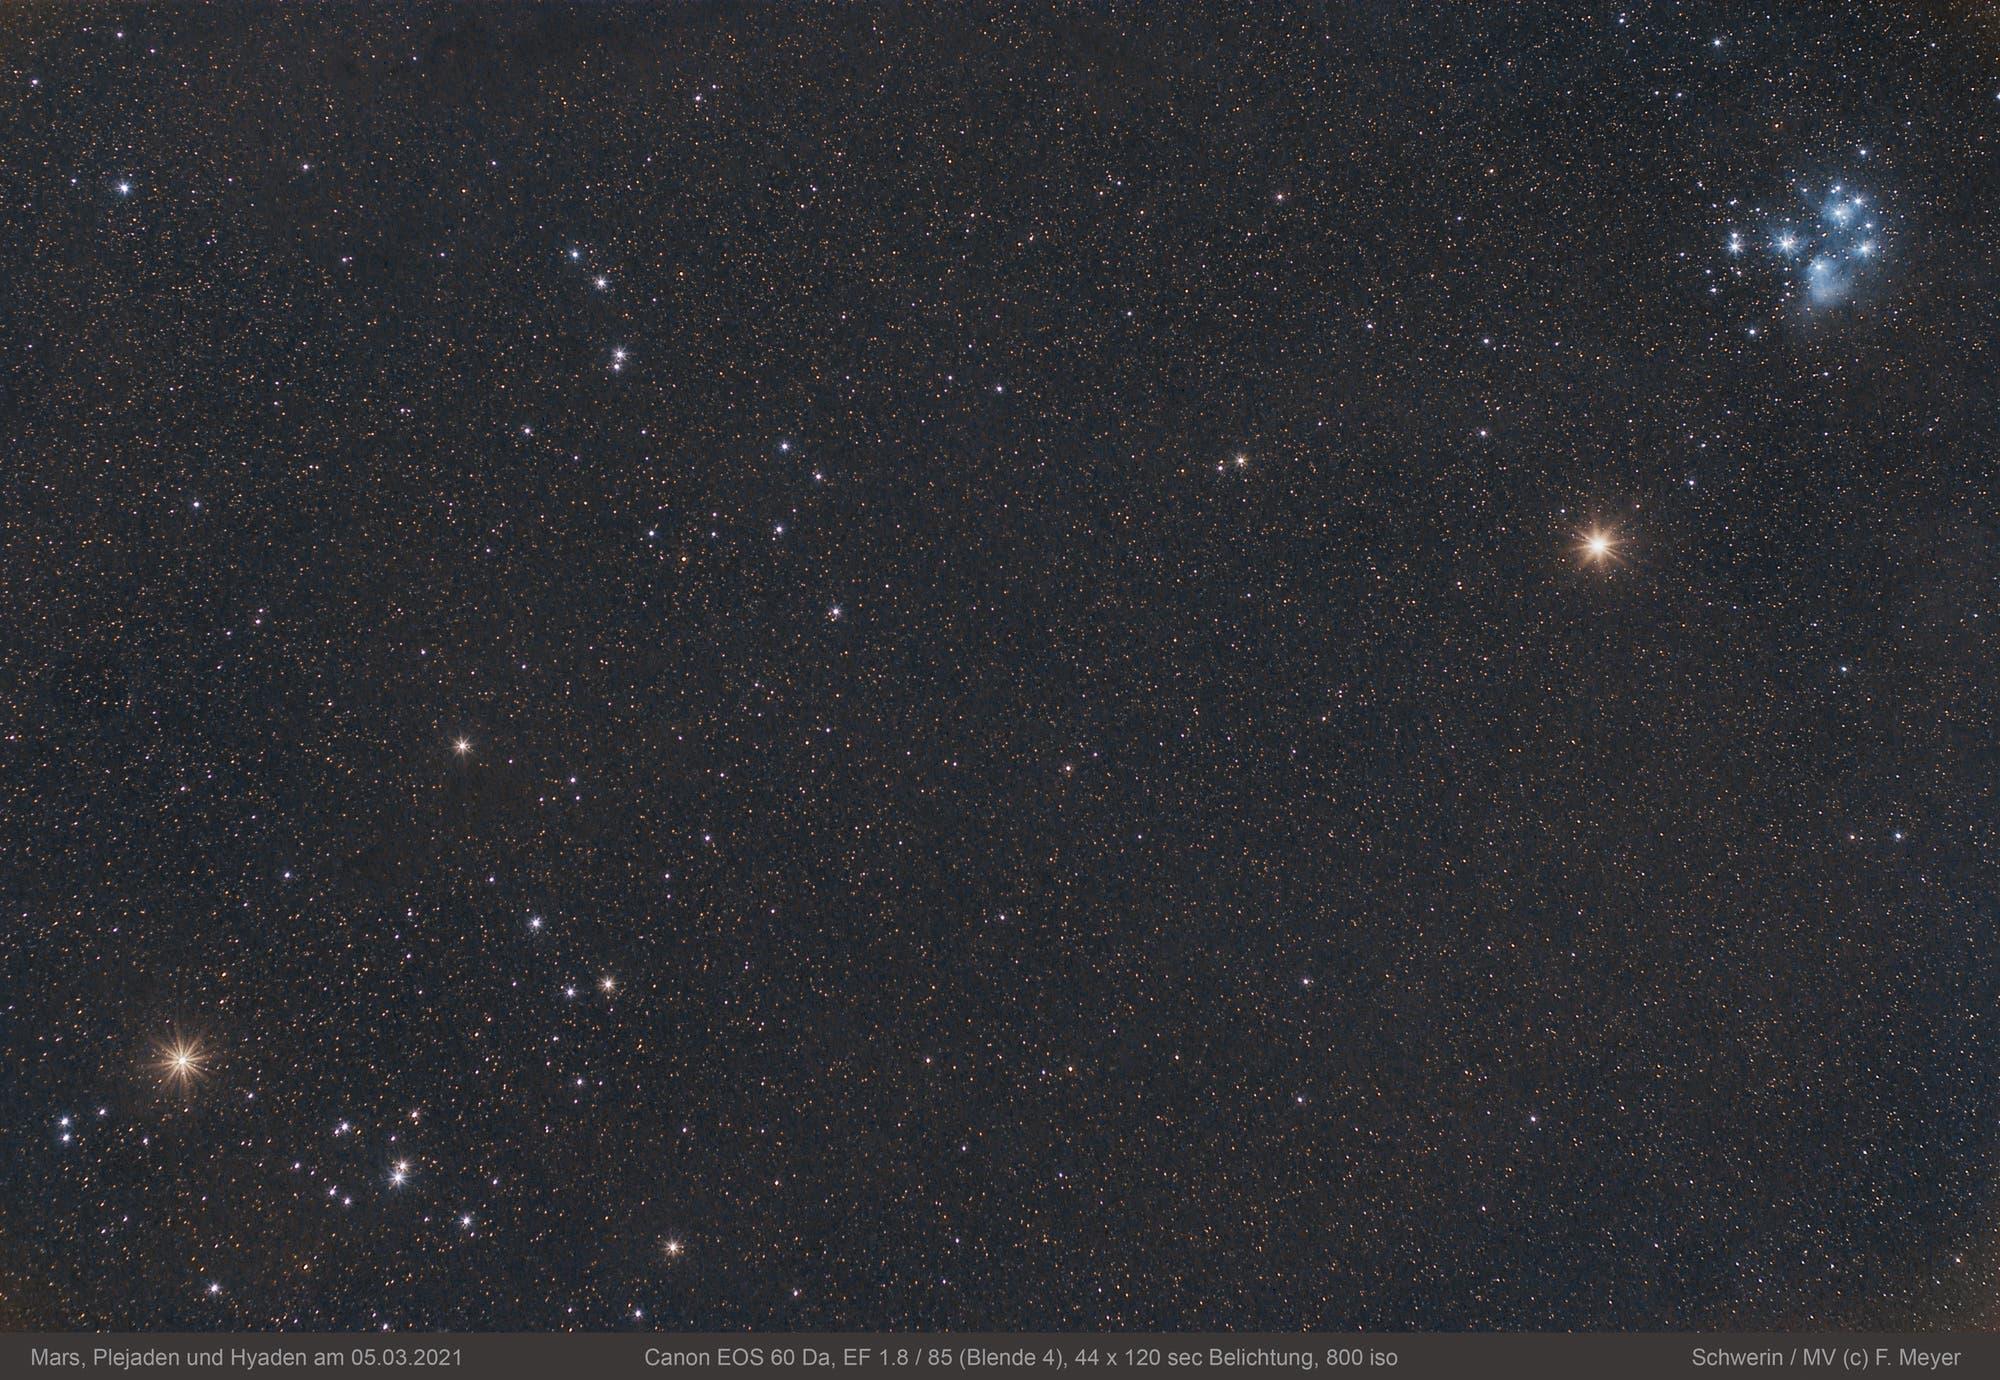 Mars, Plejaden und Hyaden am 5. März 2021